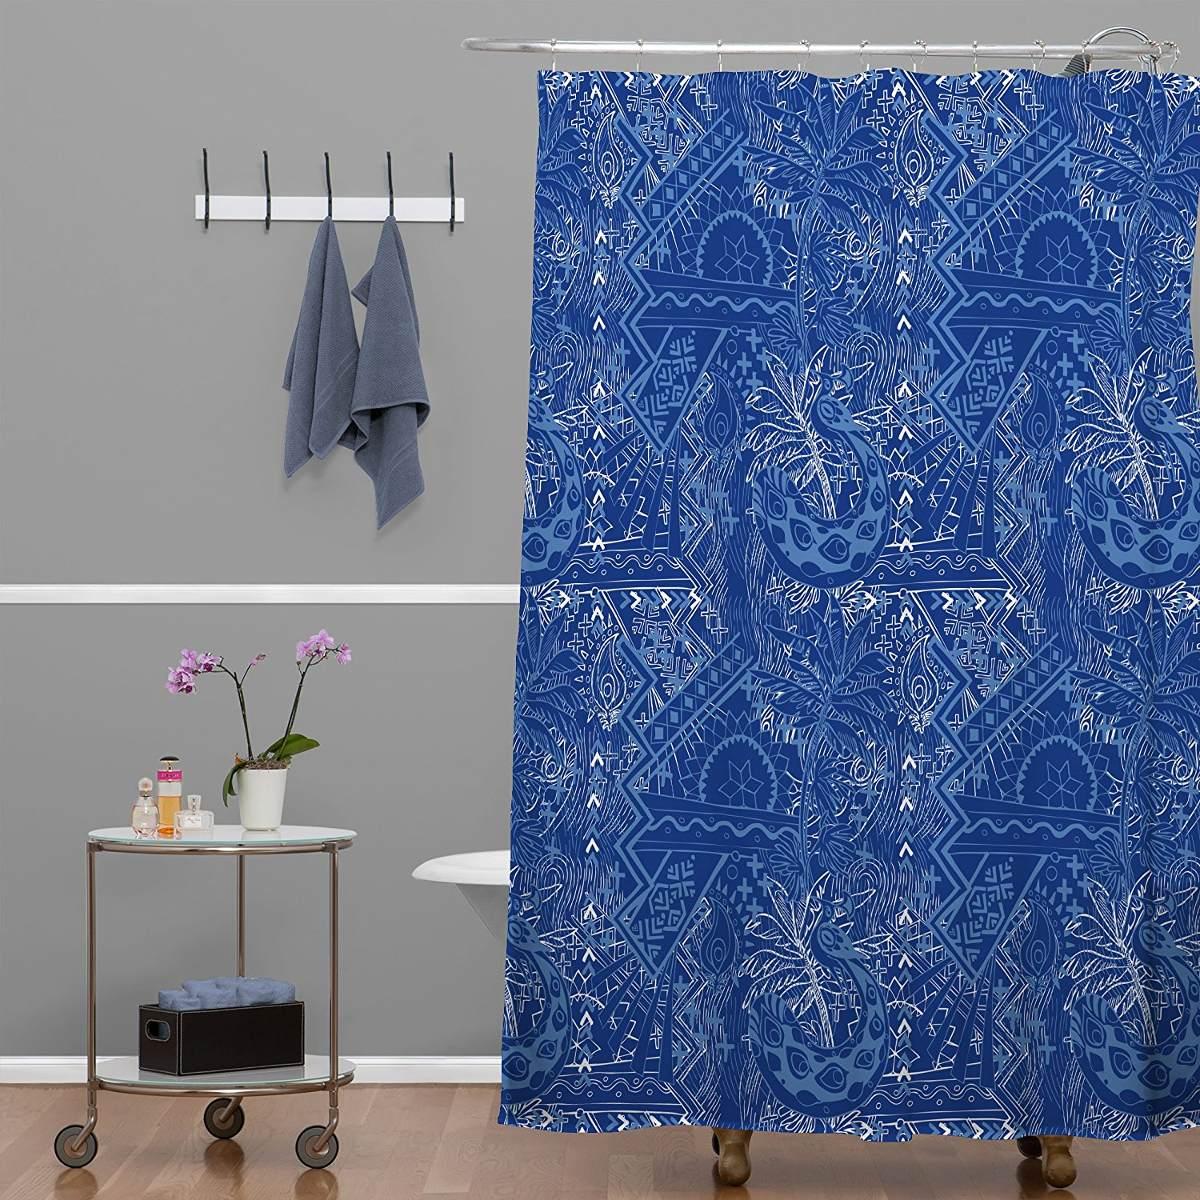 Deny Designs Geronimo Studio Blue Bombay Shower Curtain 69